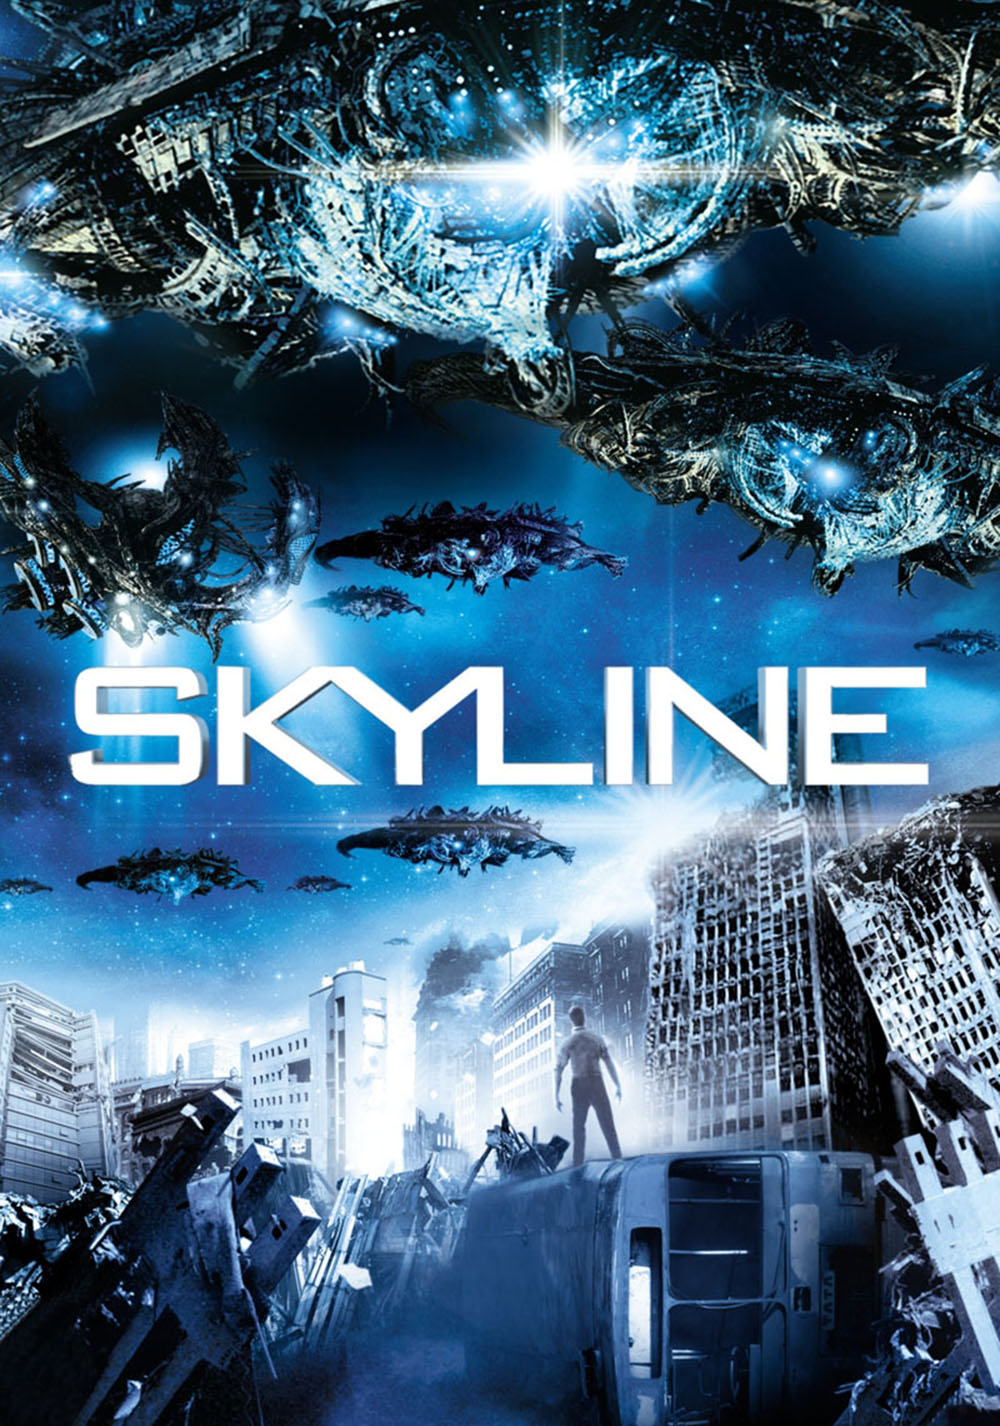 skyline movie fanart fanarttv